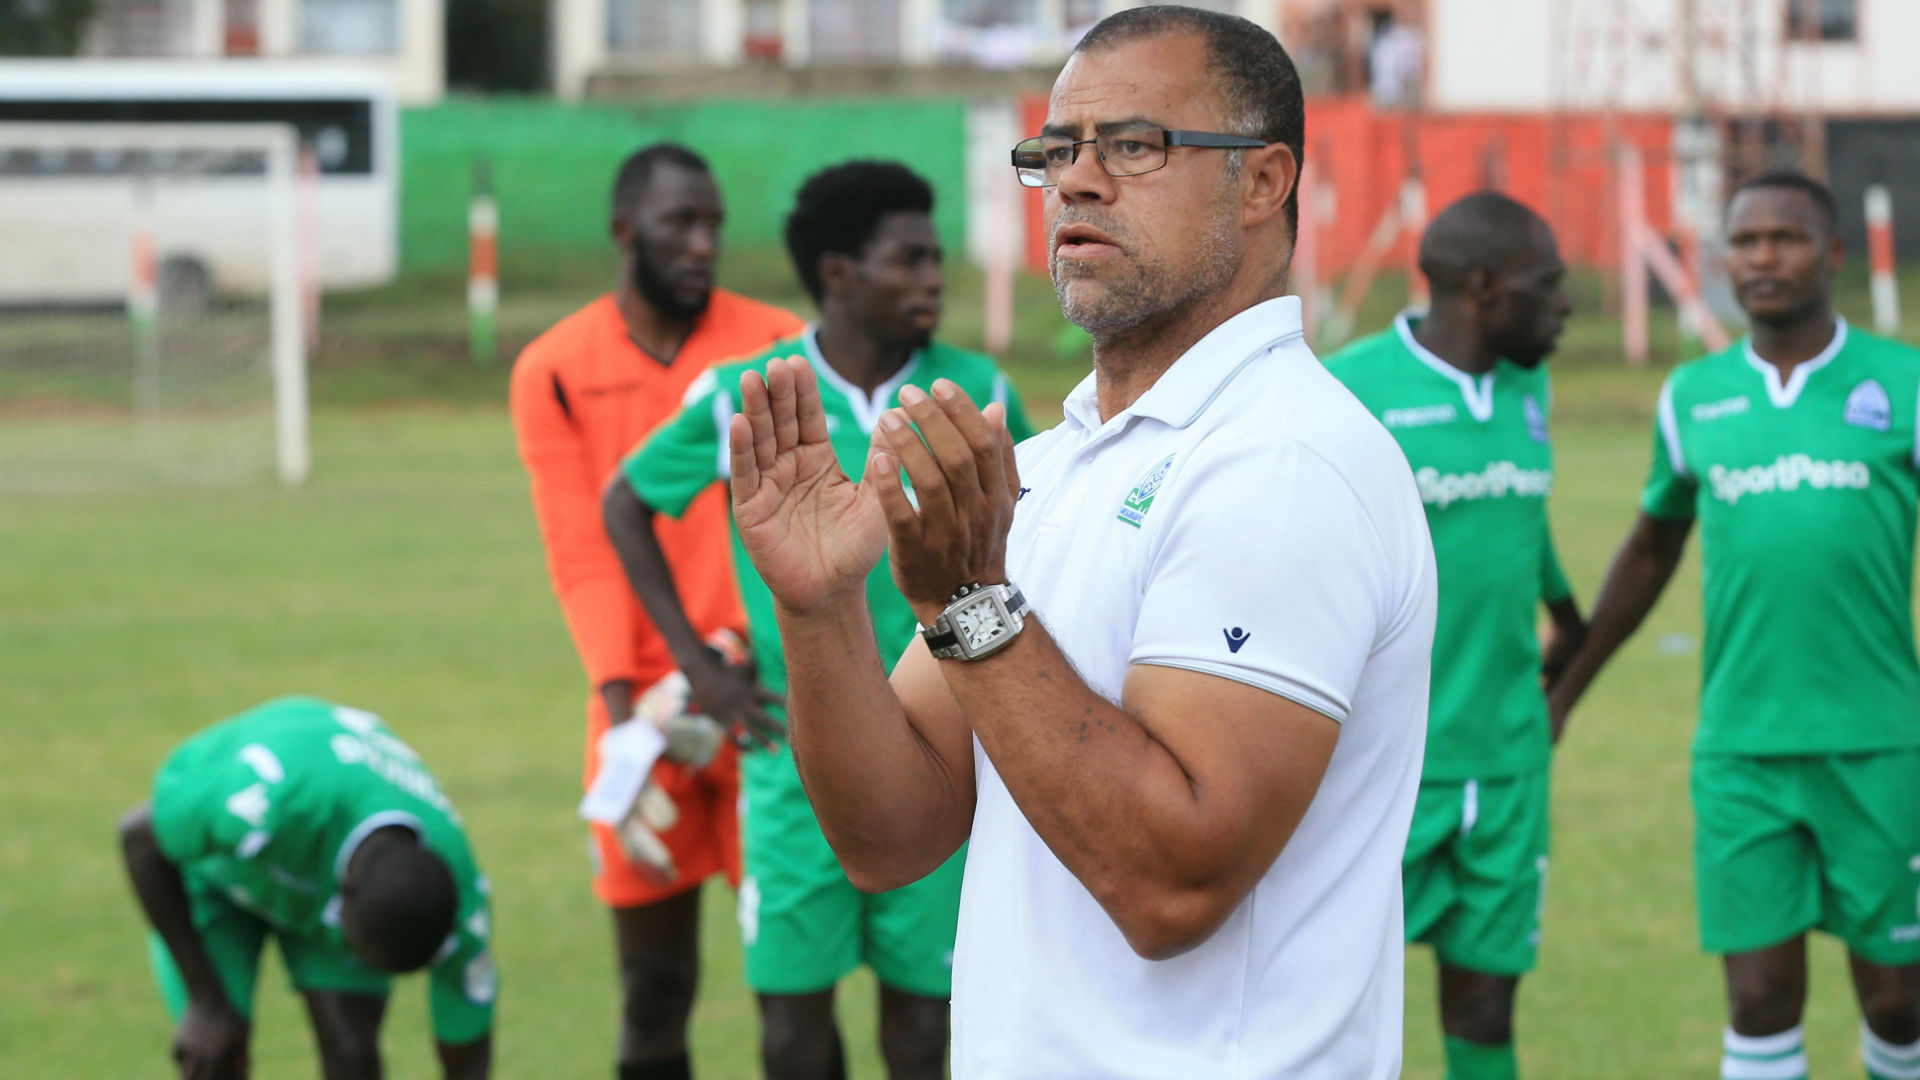 Gor Mahia coach Polack flies to England after taking the team to ...